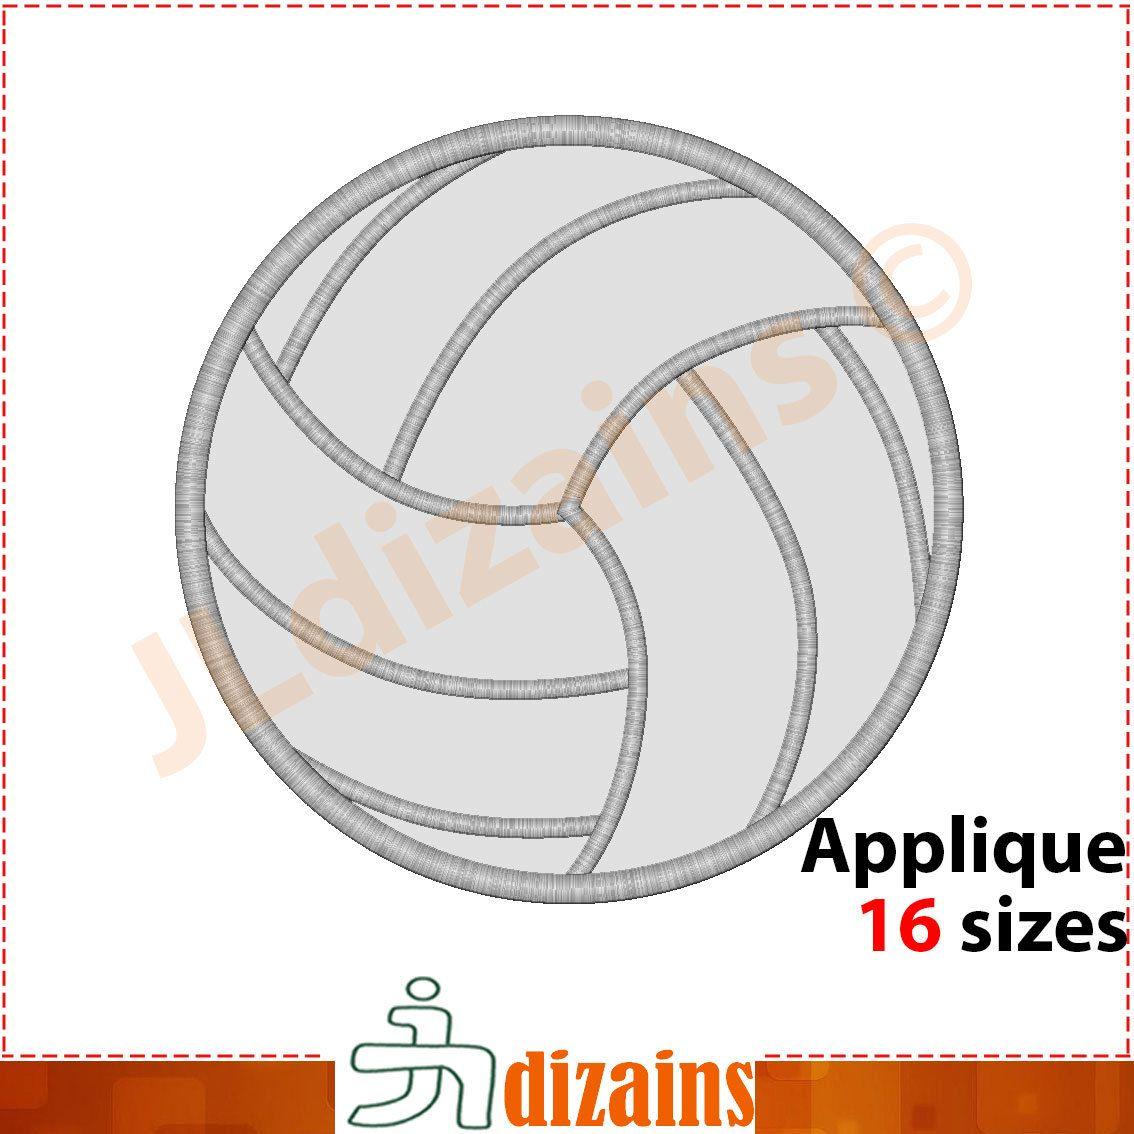 Volleyball Applique Design Volleyball Embroidery Design Etsy In 2020 Embroidery Designs New Embroidery Designs Machine Embroidery Designs